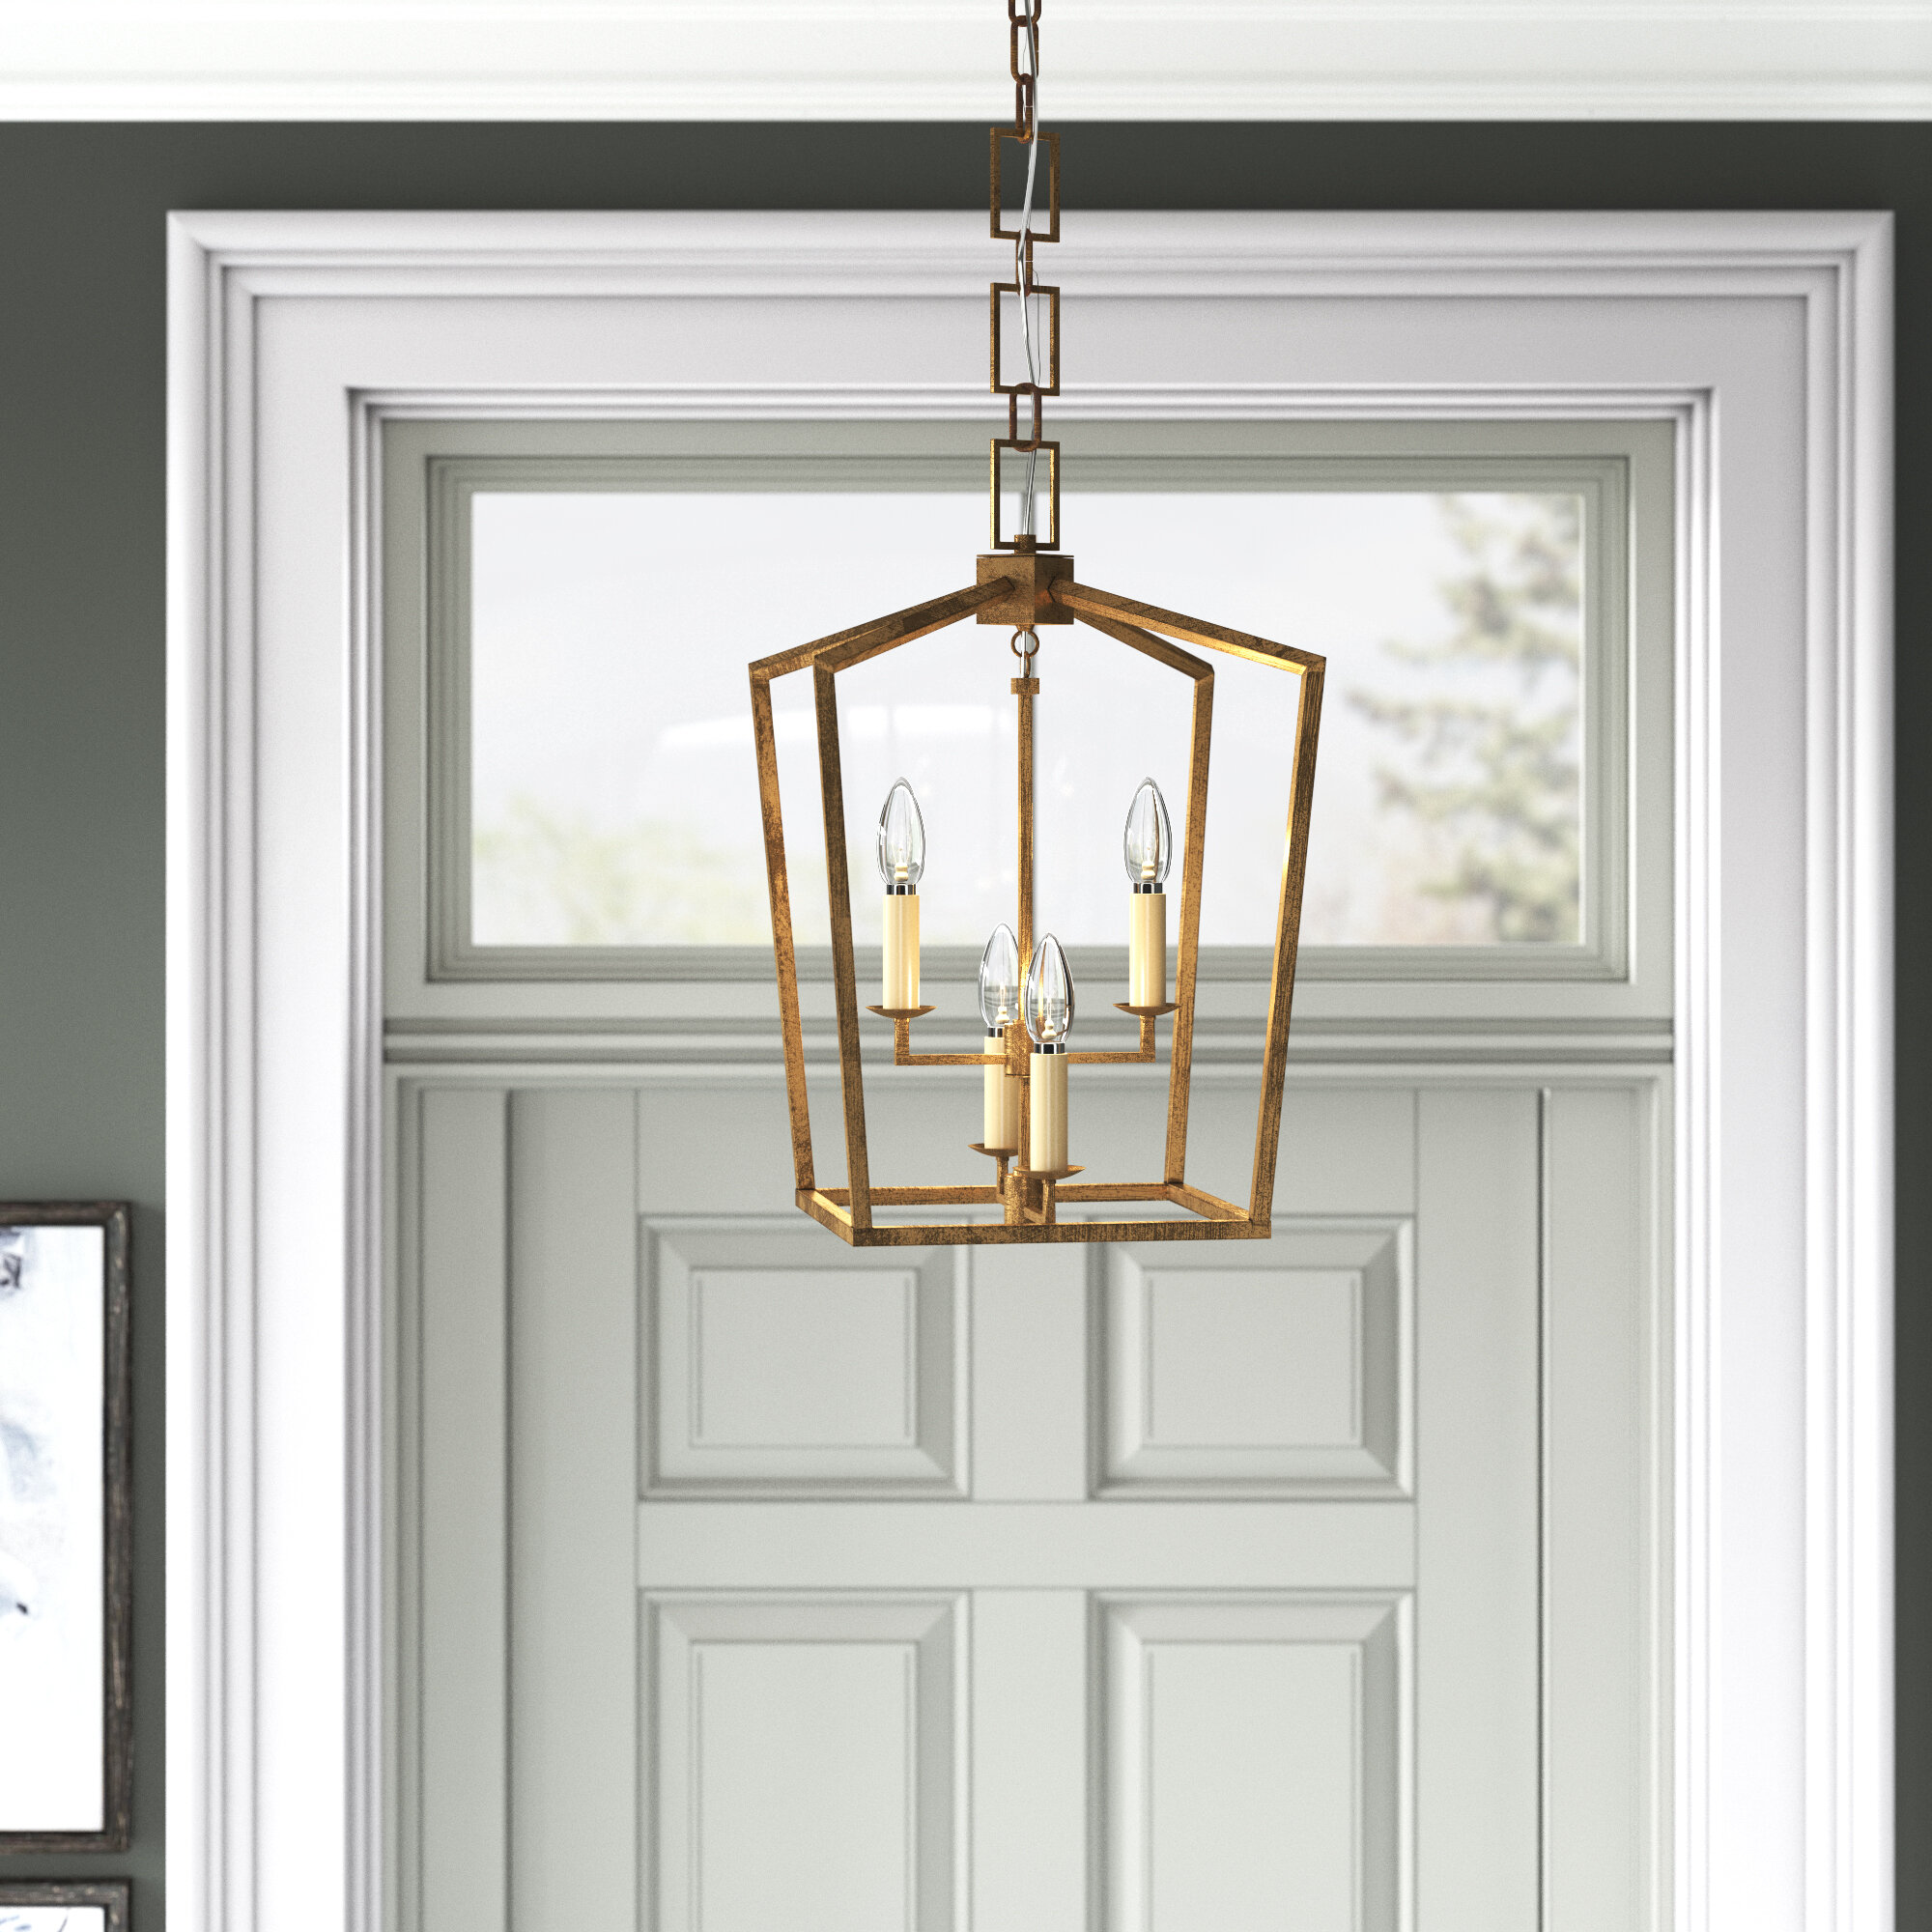 Conroy 4 Light Lantern Geometric Pendant Reviews Joss Main